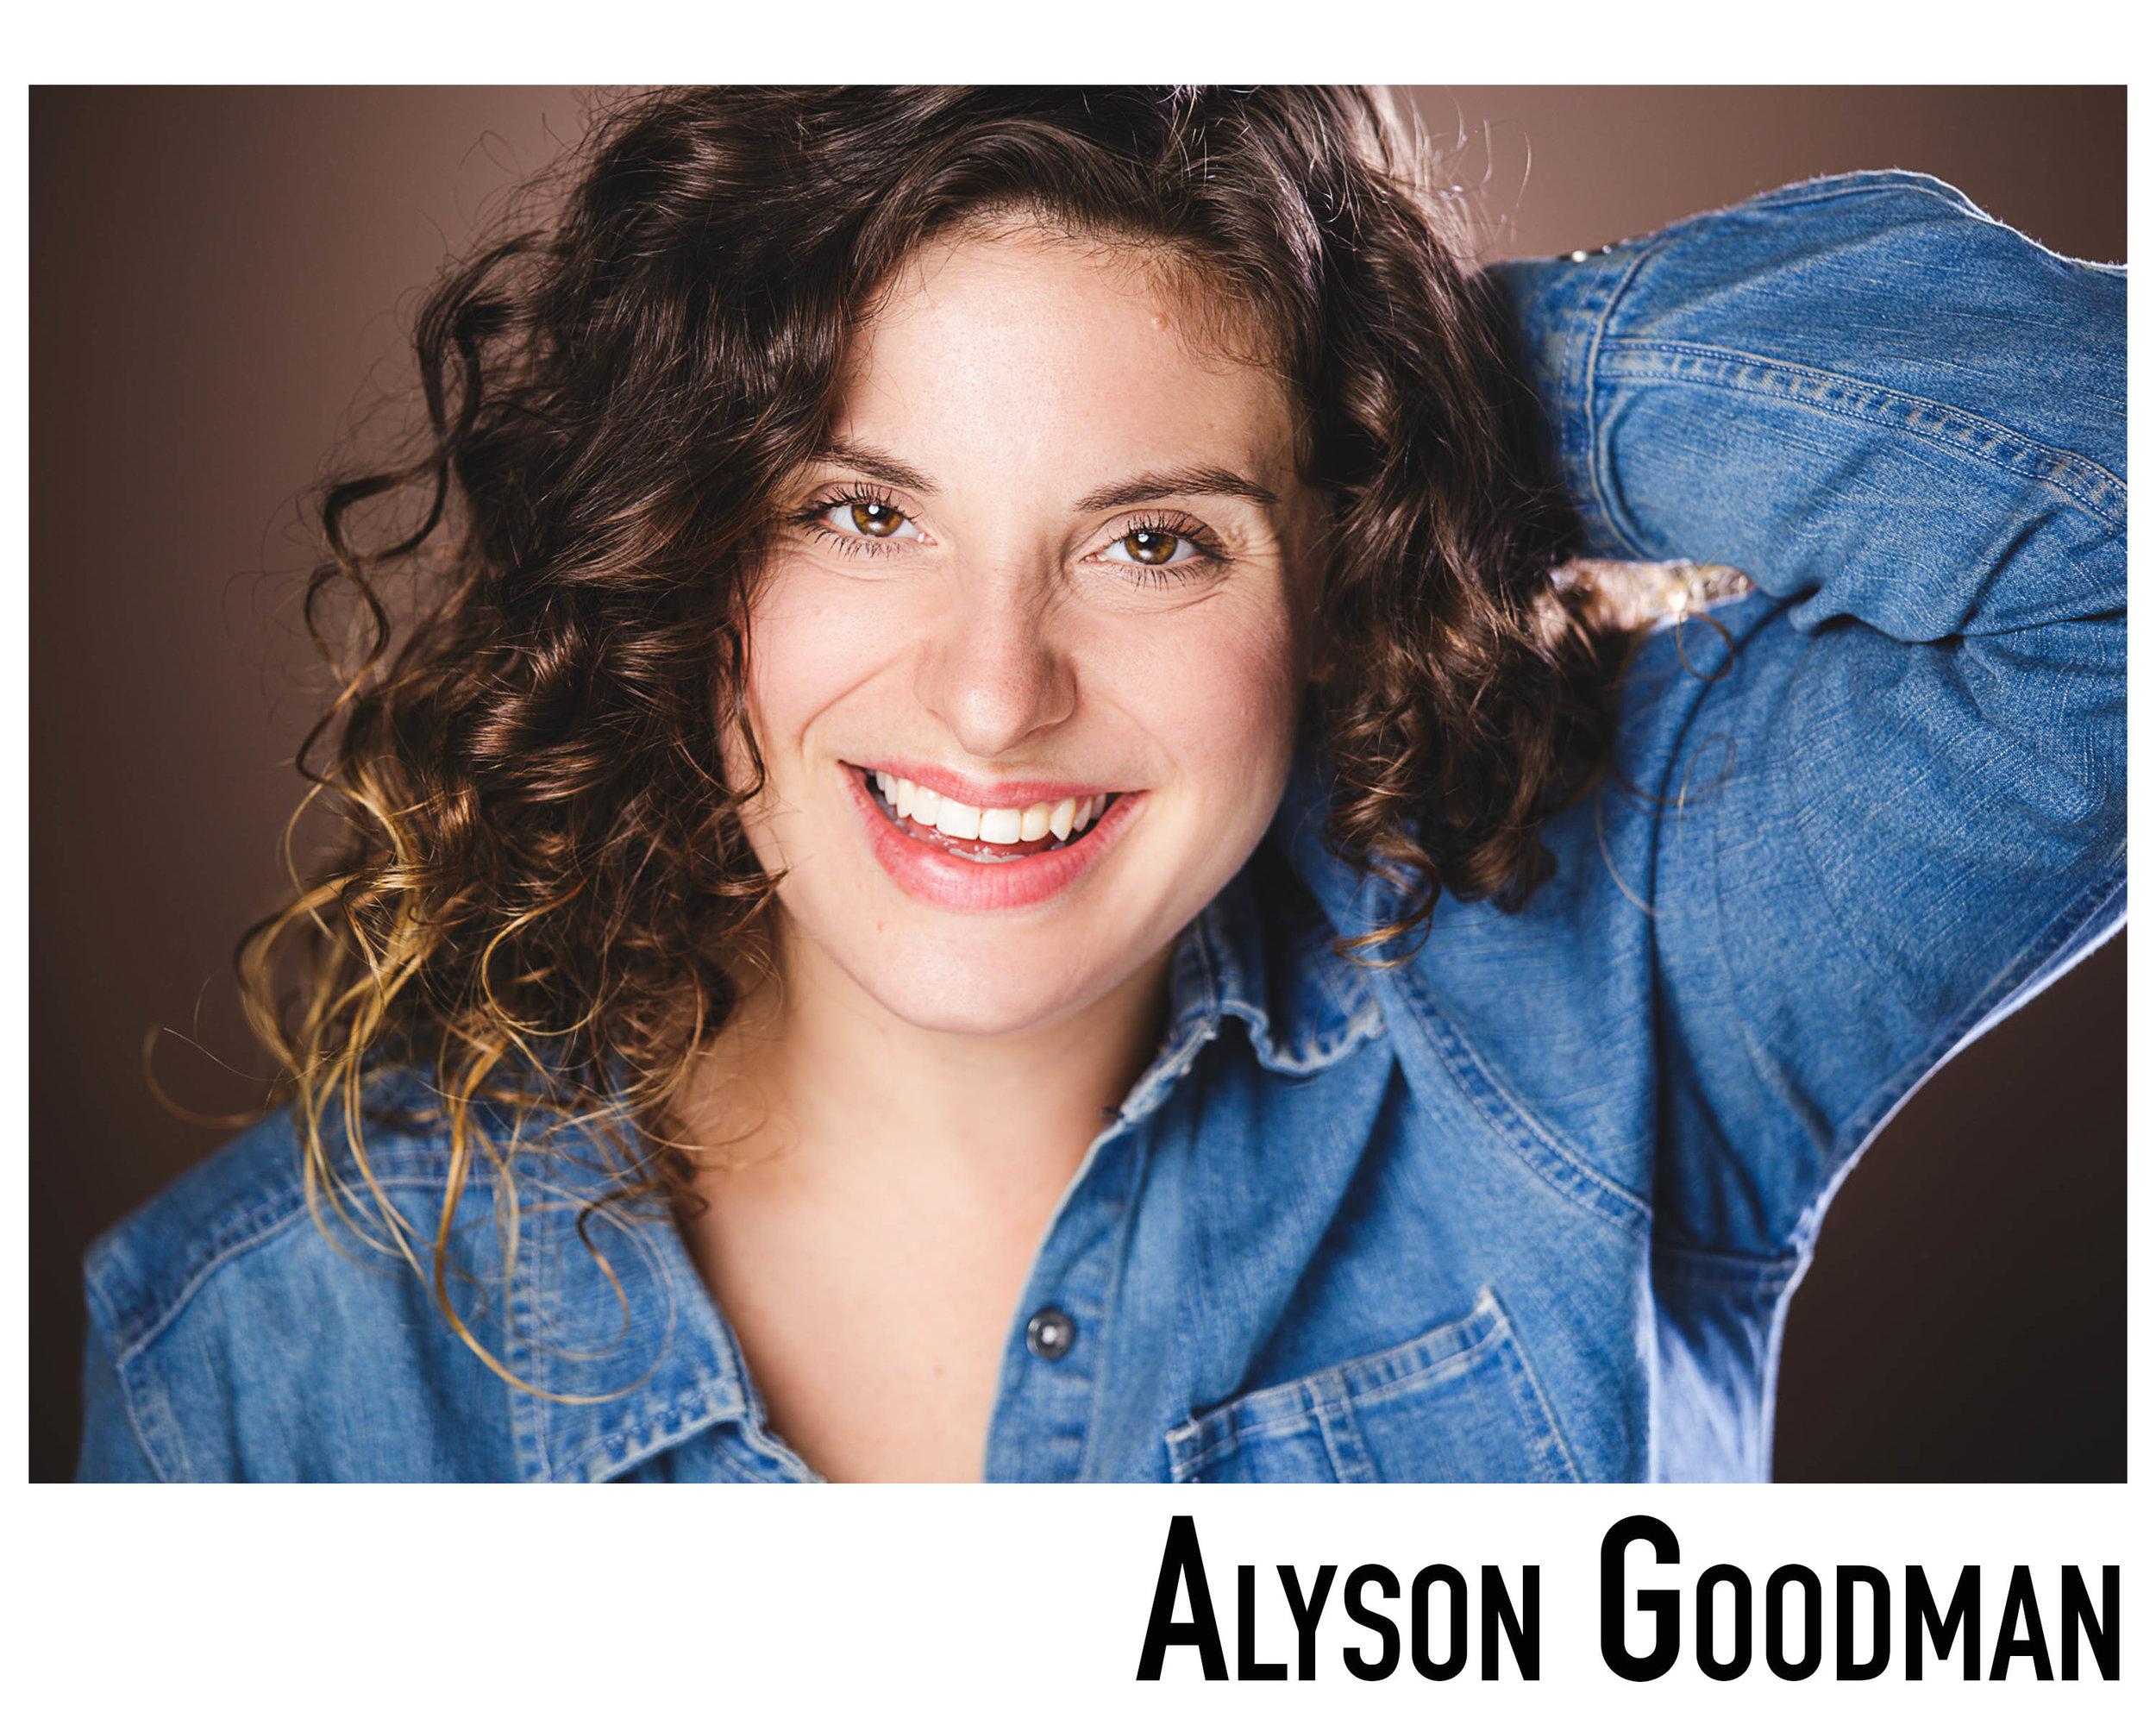 Alyson Goodman commercial headshot smaller file size.jpg